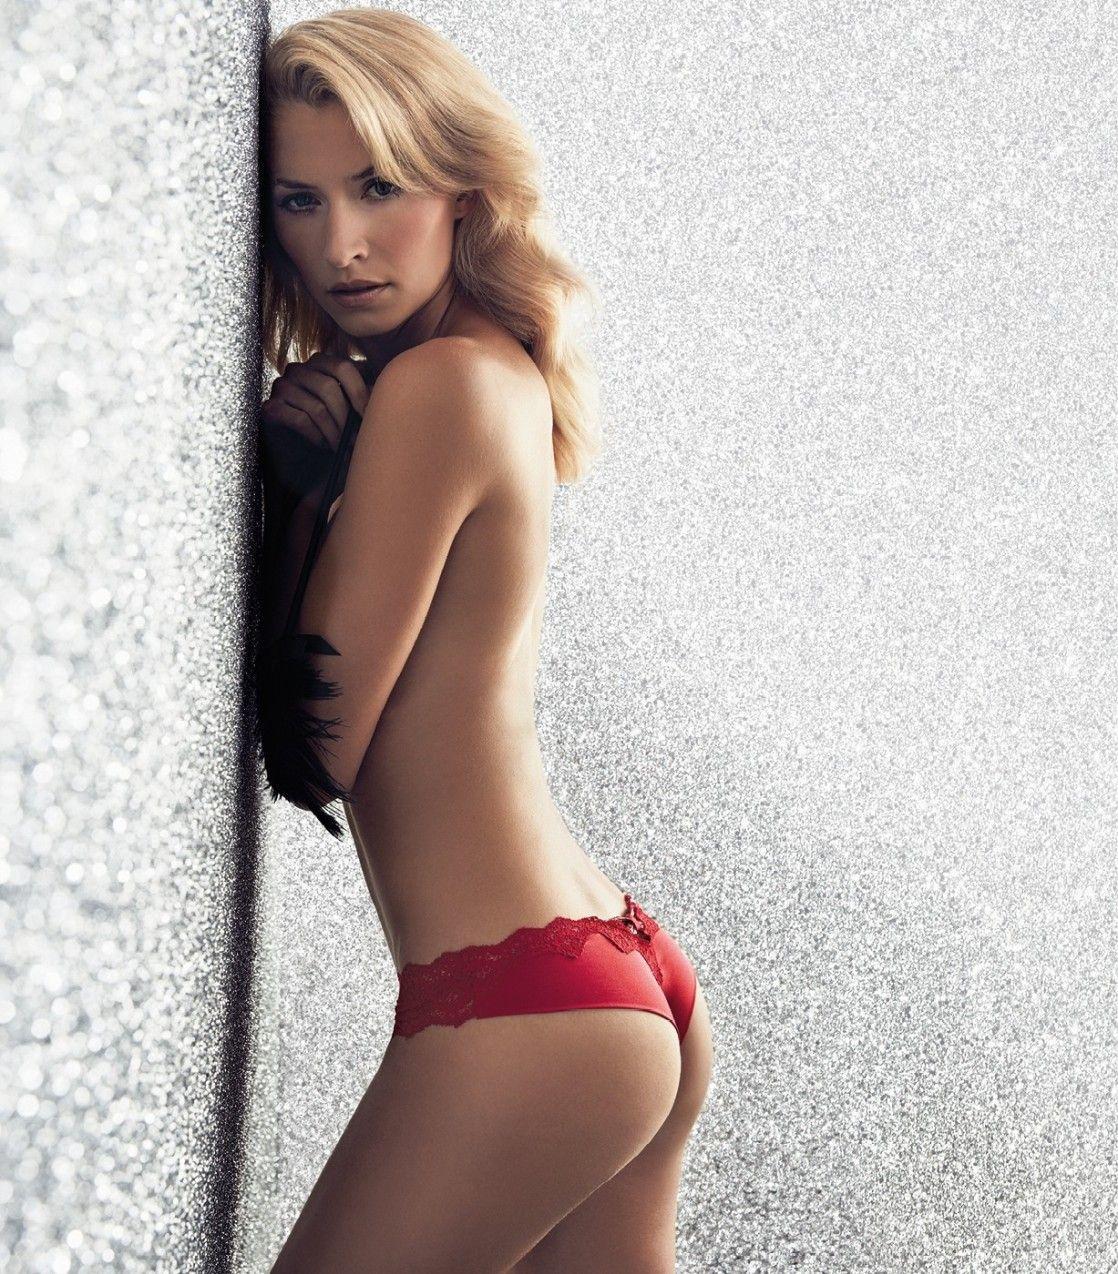 Lena Gercke topless